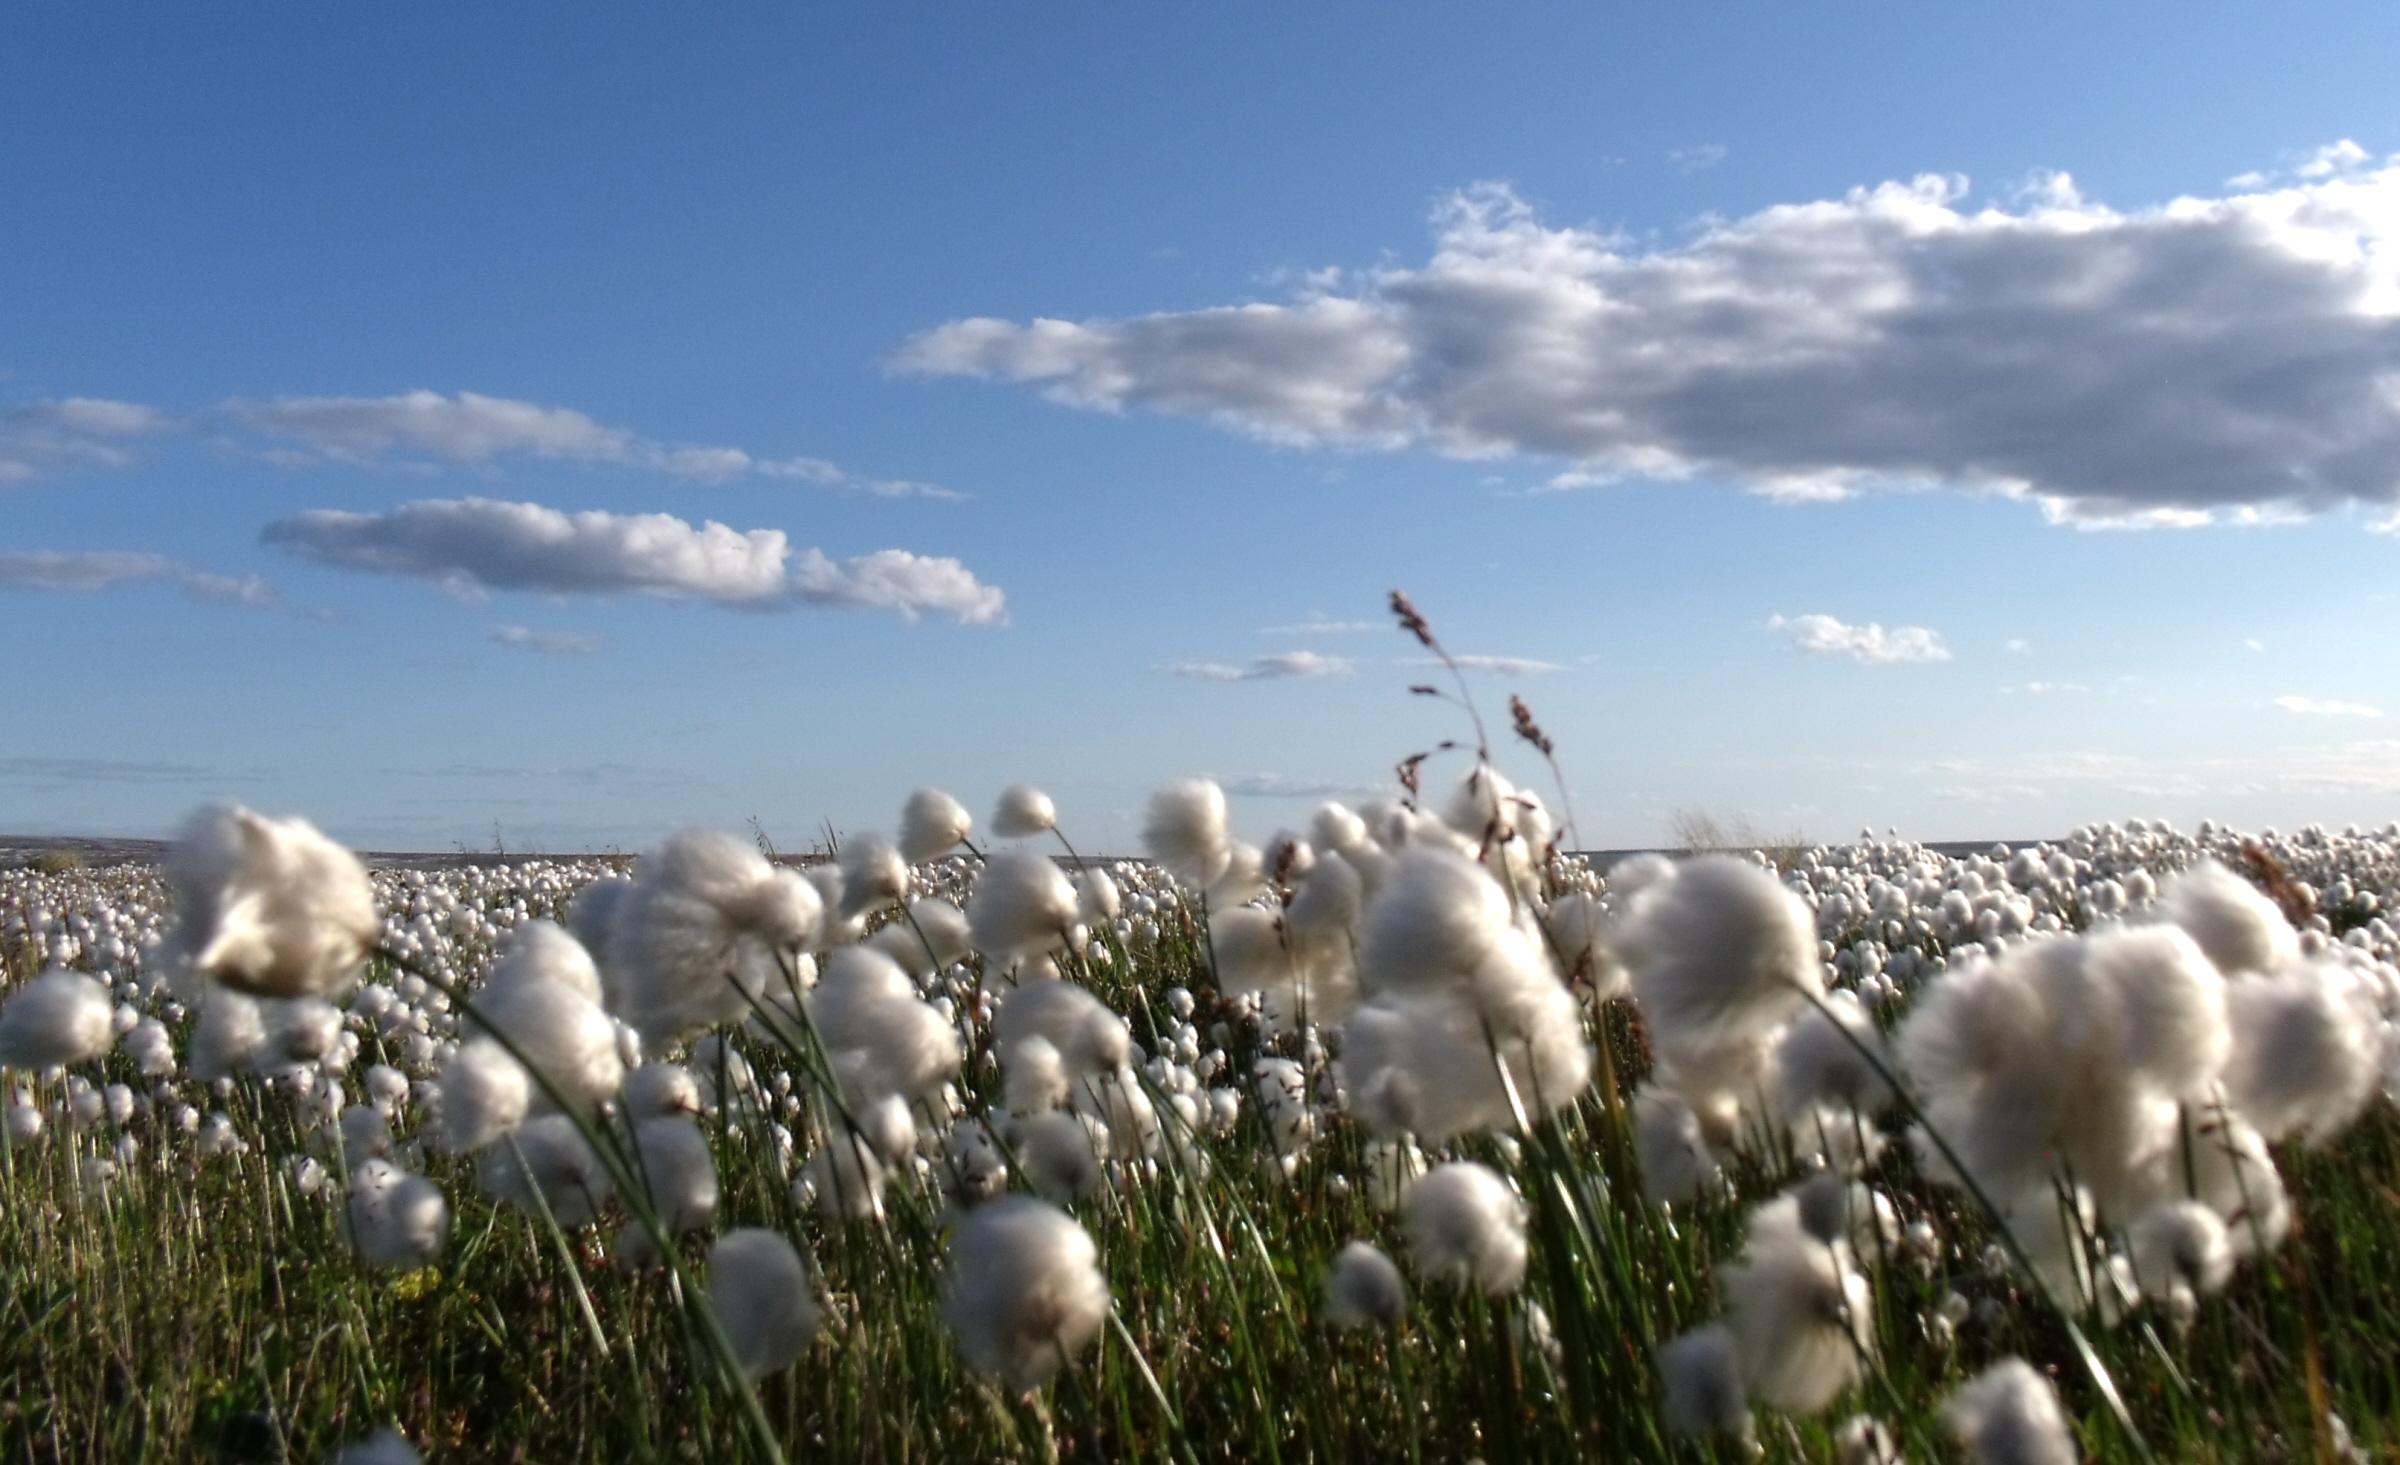 Sea of Cotton - Mike Beauregard